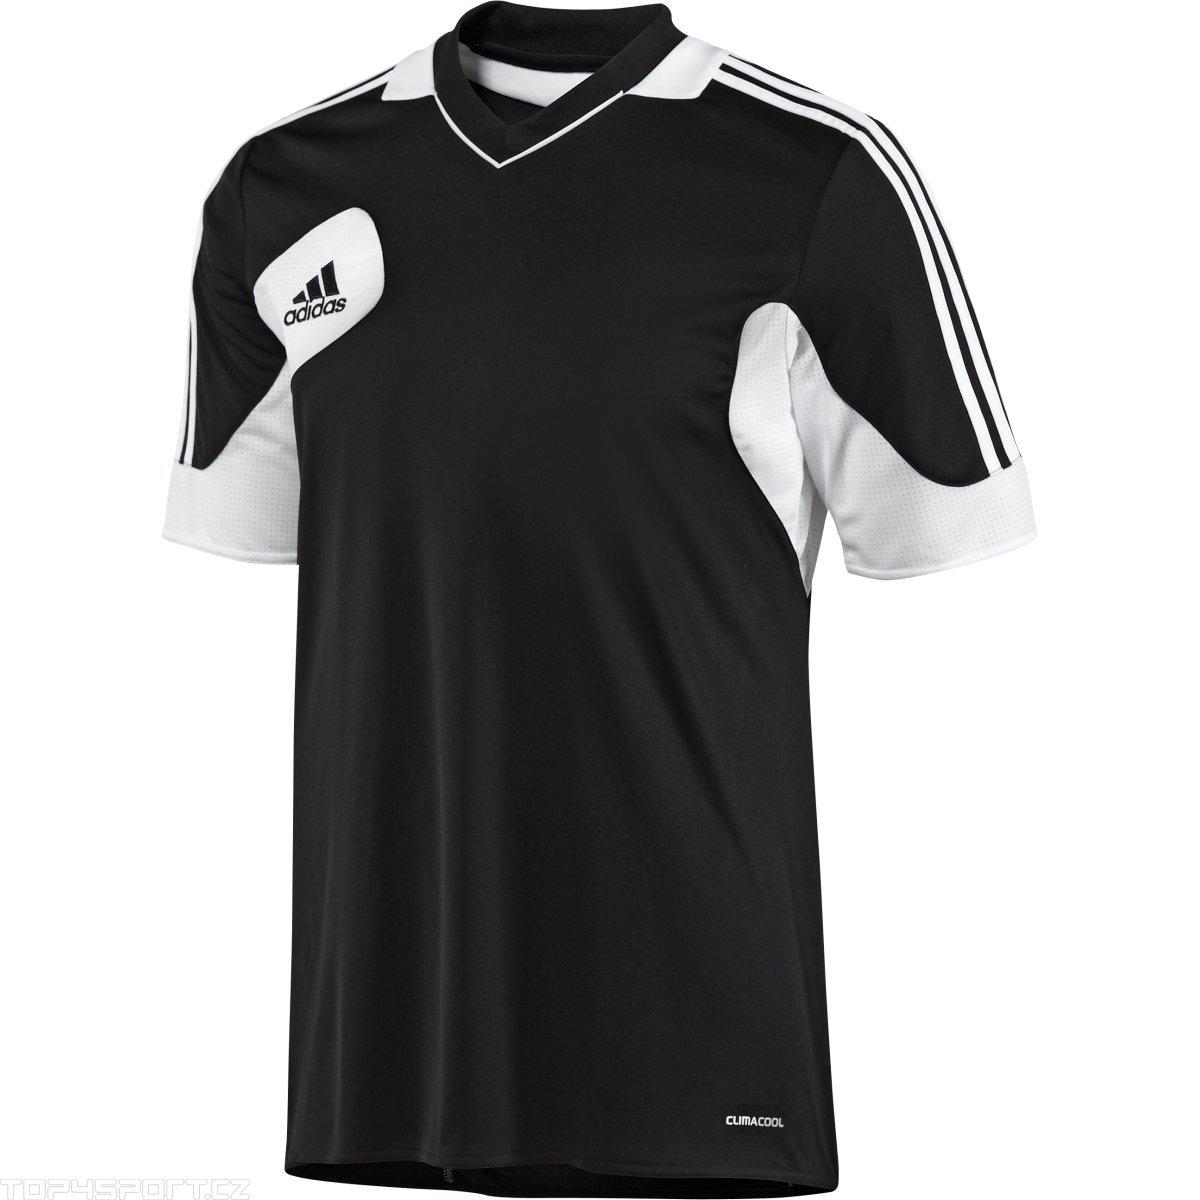 adidas condivo 12 herren trainings shirt sport trikot. Black Bedroom Furniture Sets. Home Design Ideas